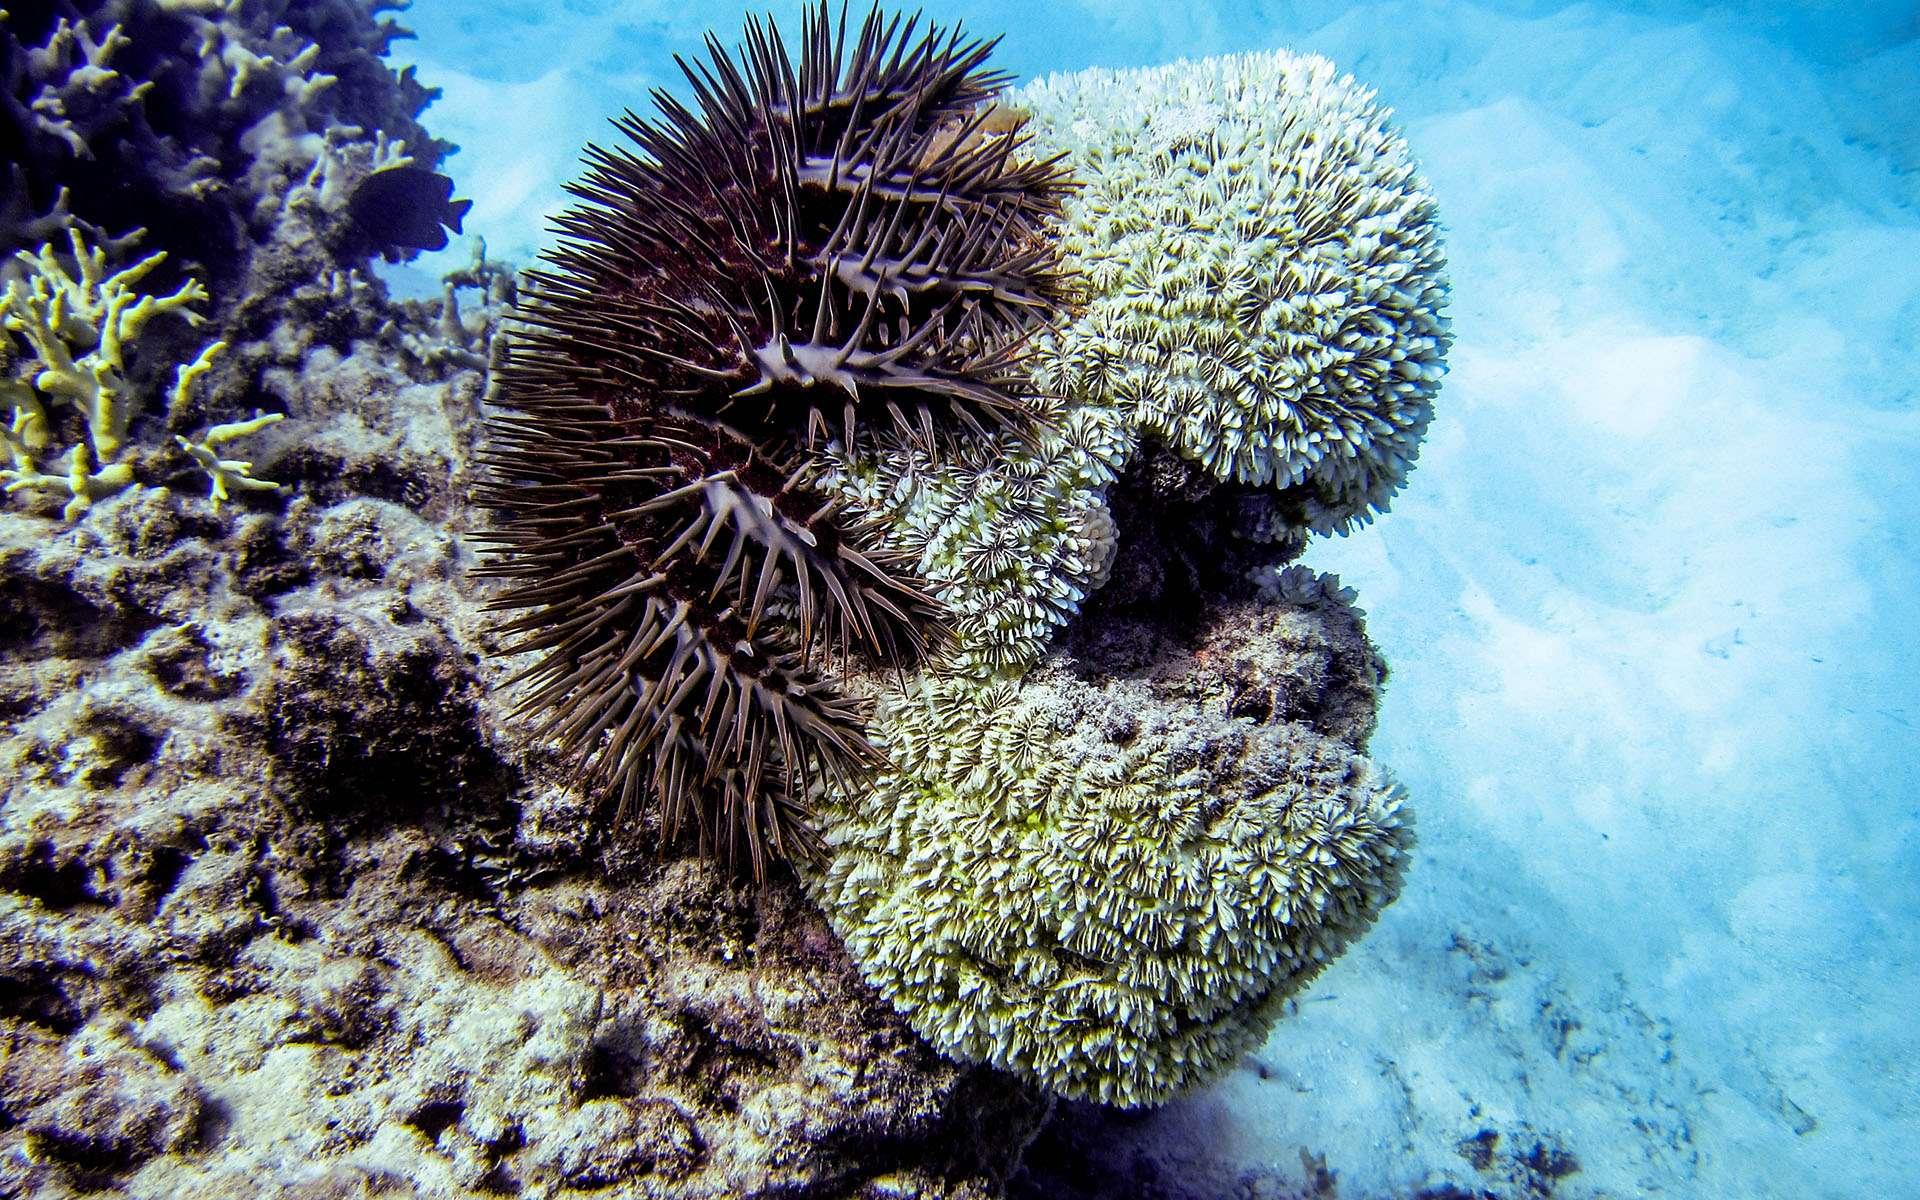 Une ancasthater pourpre qui s'attaque à du corail. © Ryan McMinds, Creative Commons Attribution 2.0 Generic